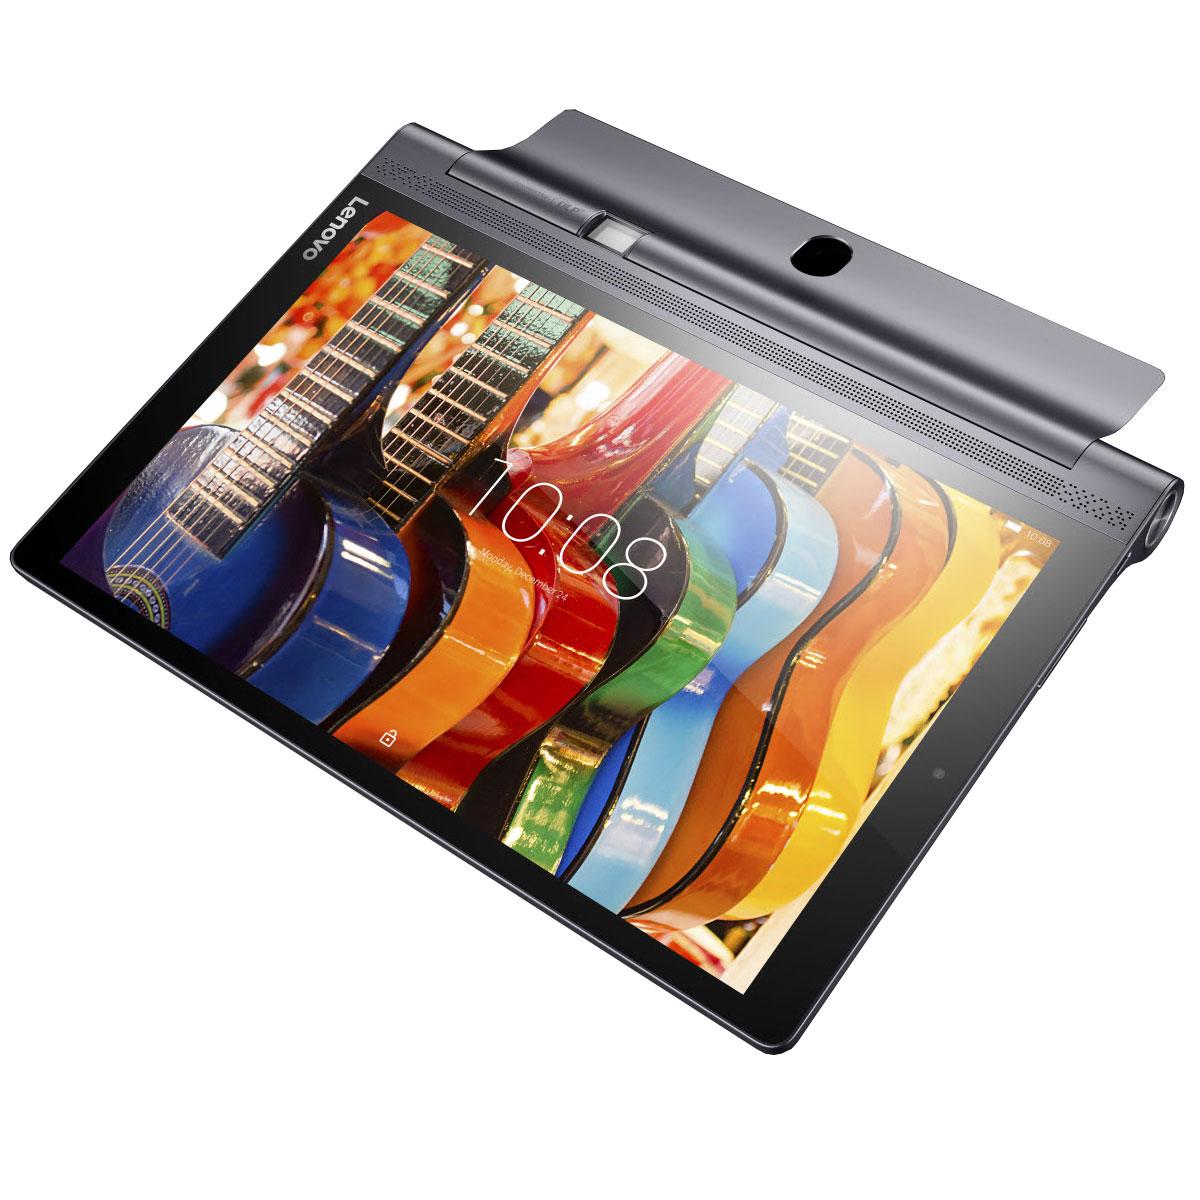 Lenovo Yoga Tab 3 Pro 10 ZA0F0106SE